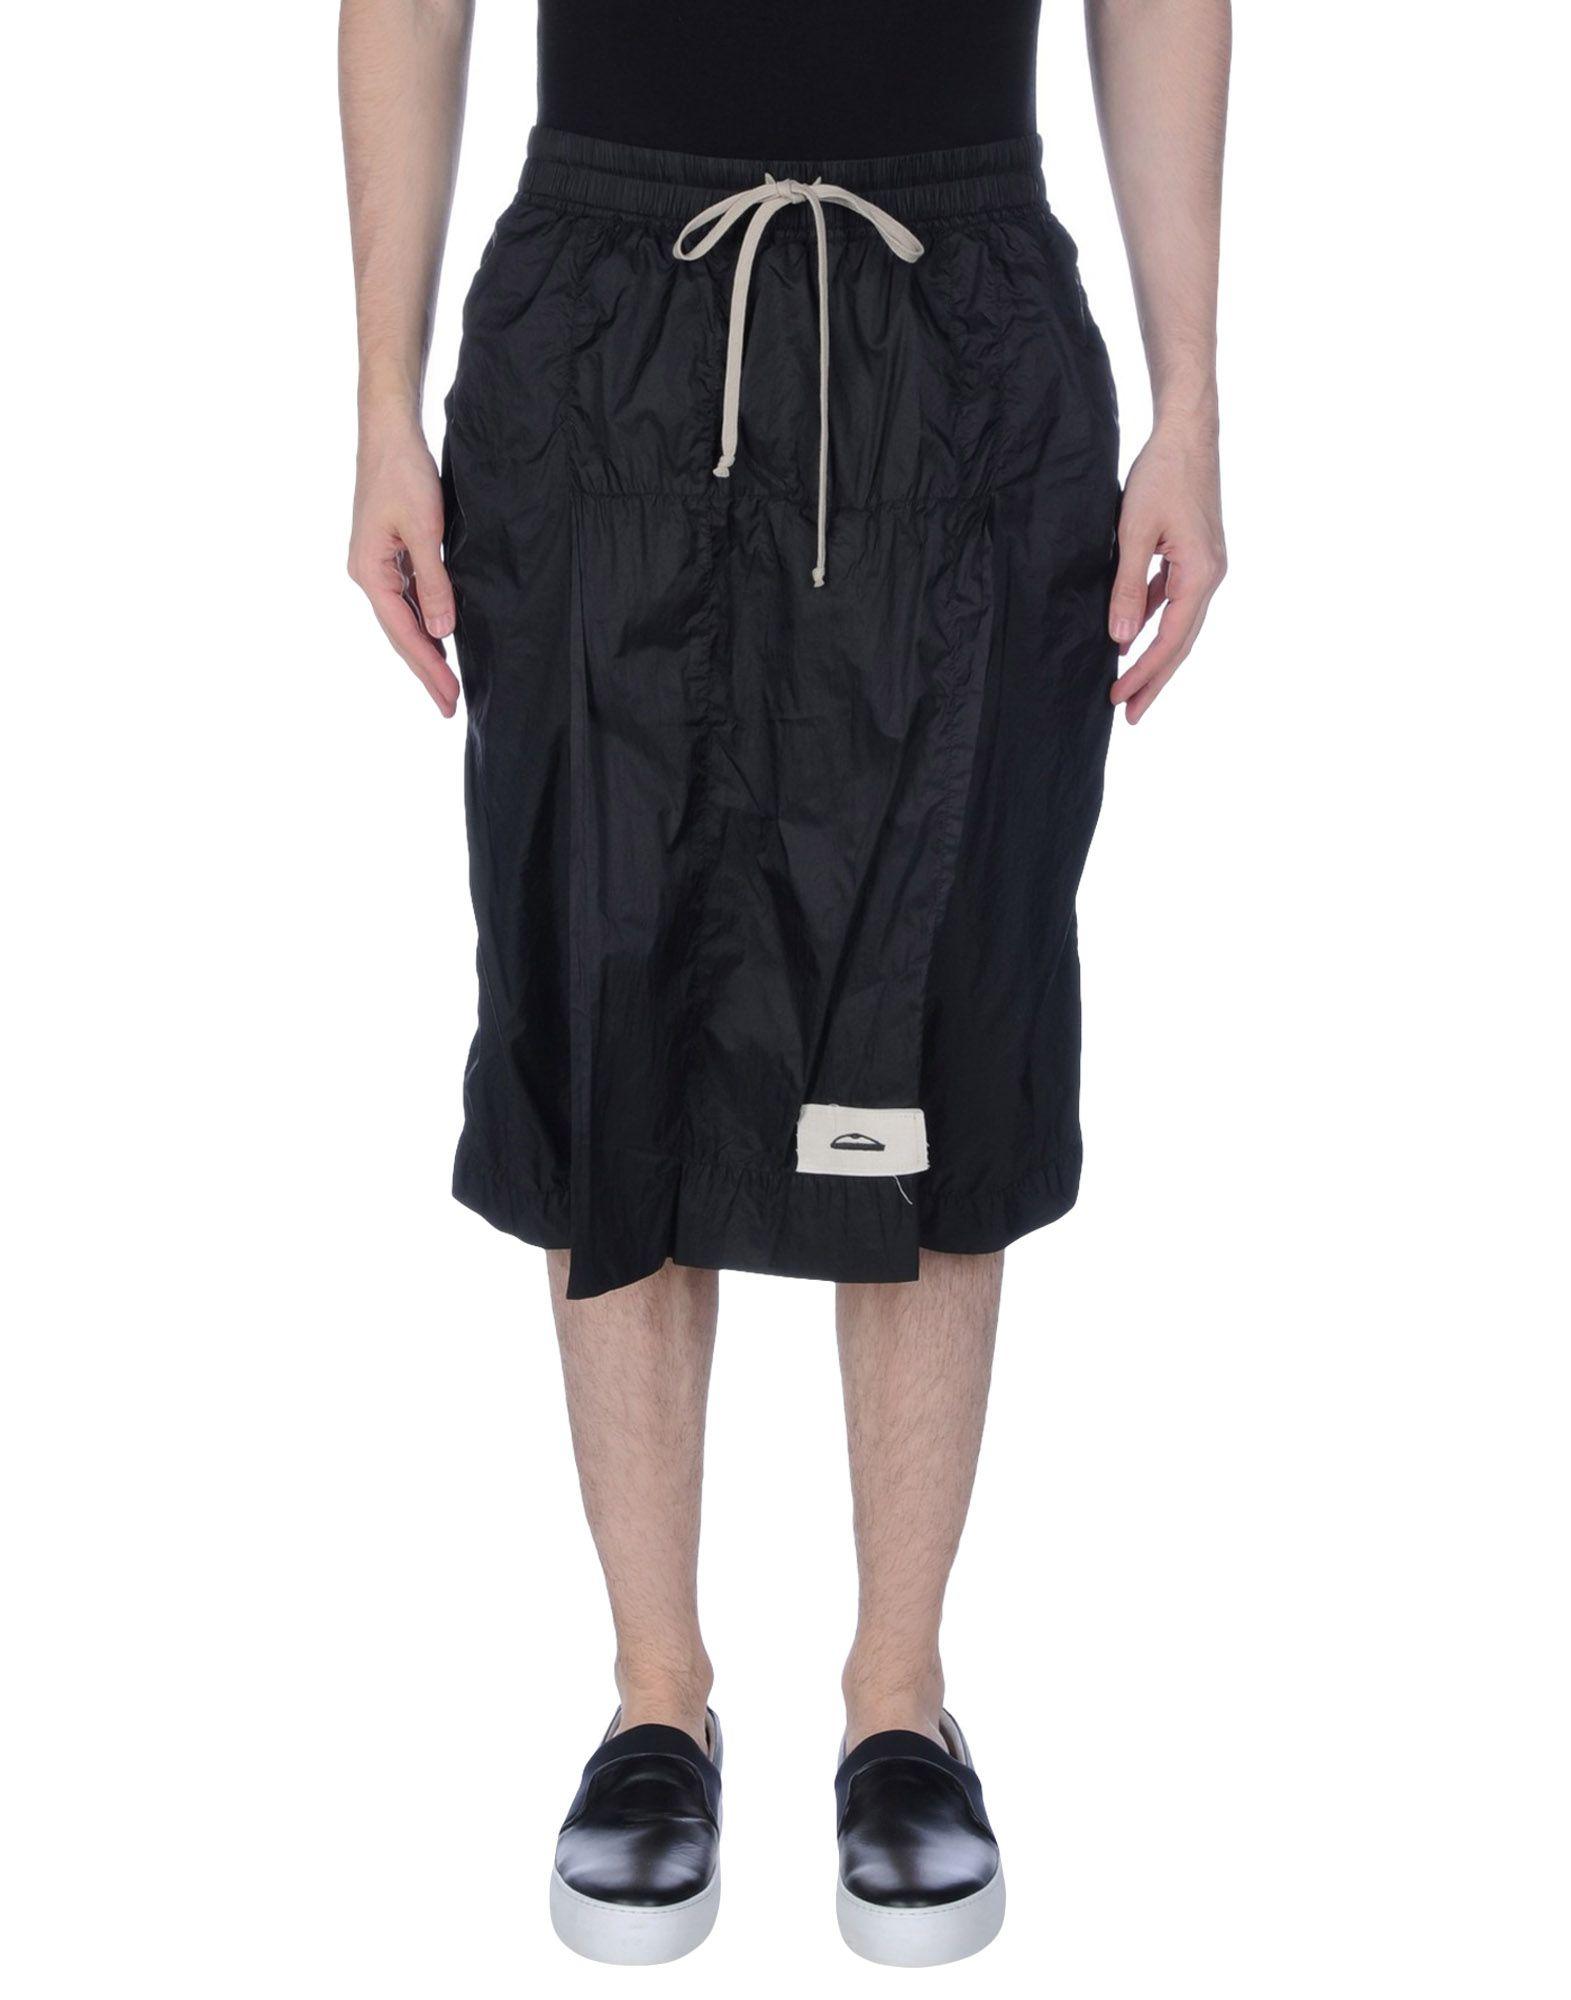 Pantalone Capri Drkshdw By Rick Owens Uomo - Acquista online su